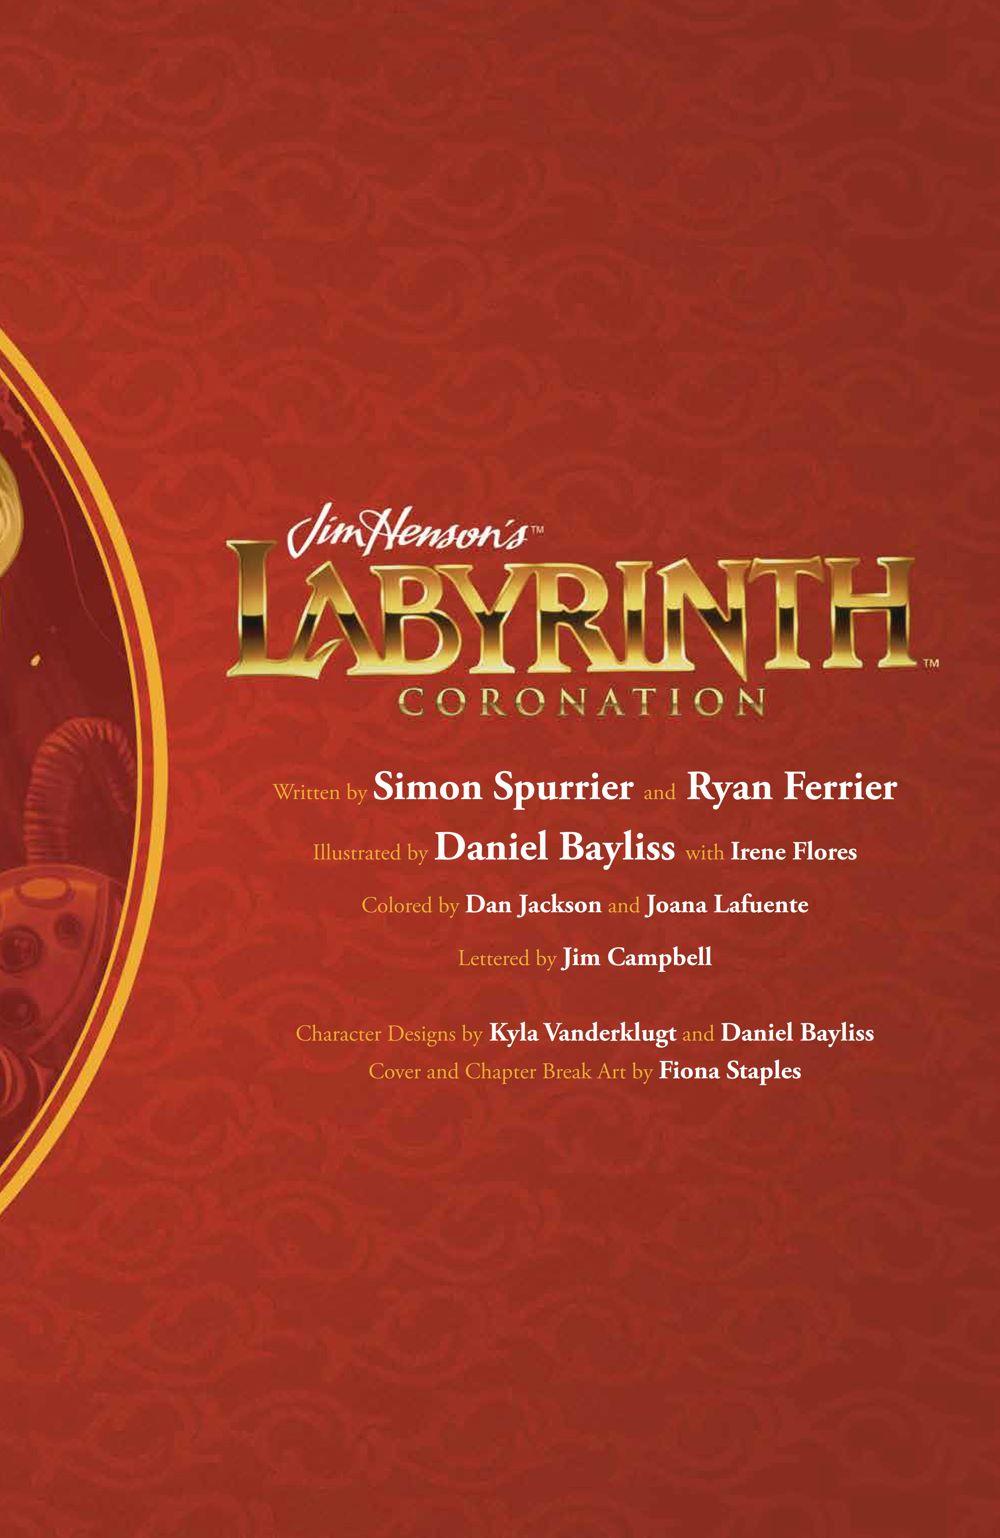 LabyrinthCoronation_v2_SC_PRESS_5 ComicList Previews: JIM HENSON'S LABYRINTH CORONATION VOLUME 2 TP